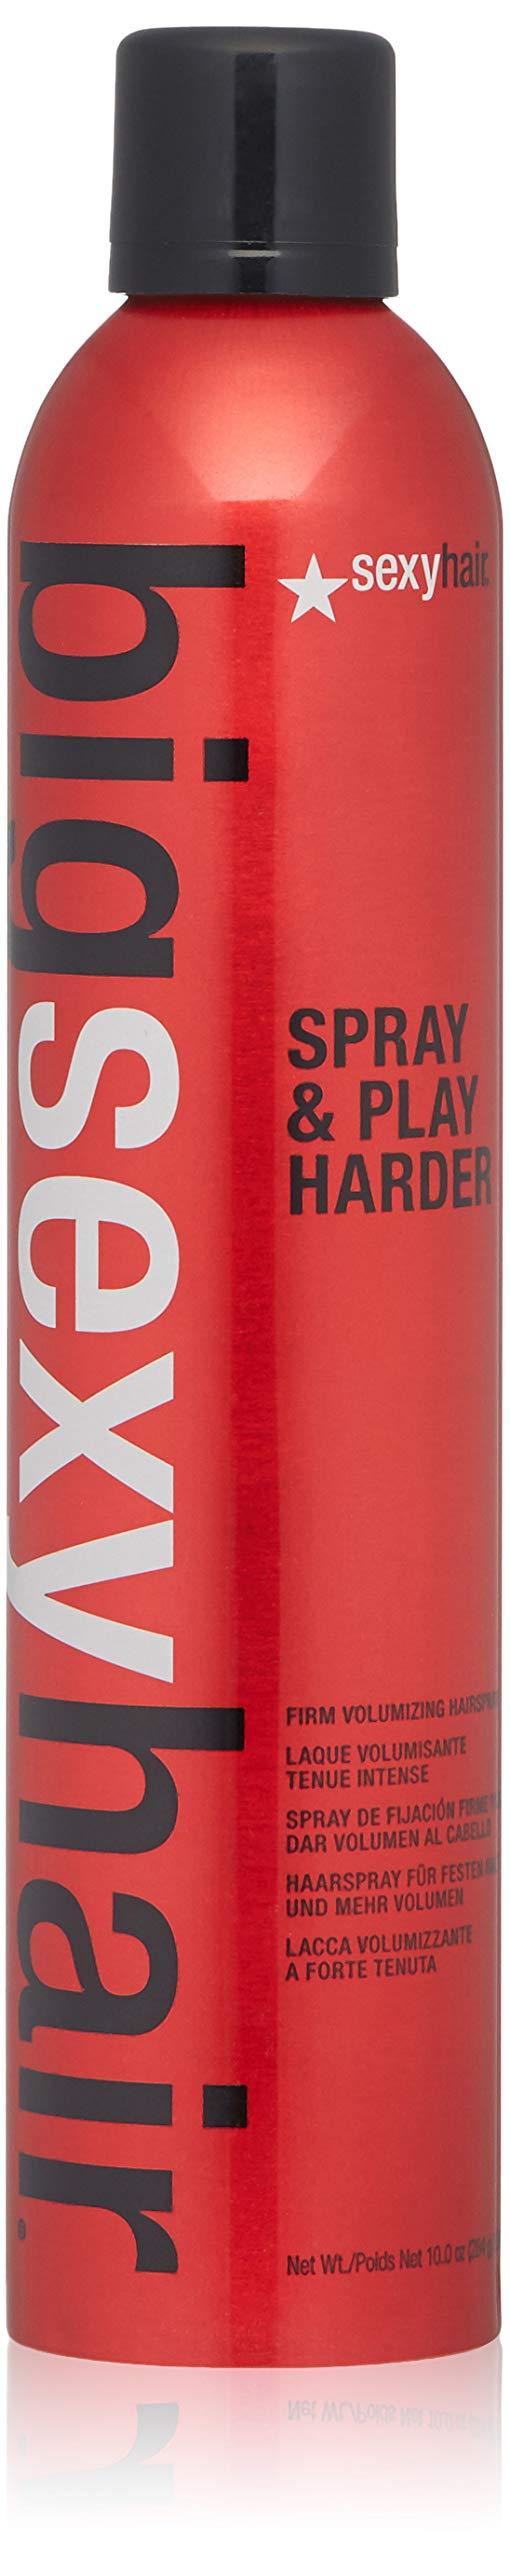 SEXYHAIR Big Spray & Play Harder Firm Volumizing Hairspray, 10 oz by SEXYHAIR